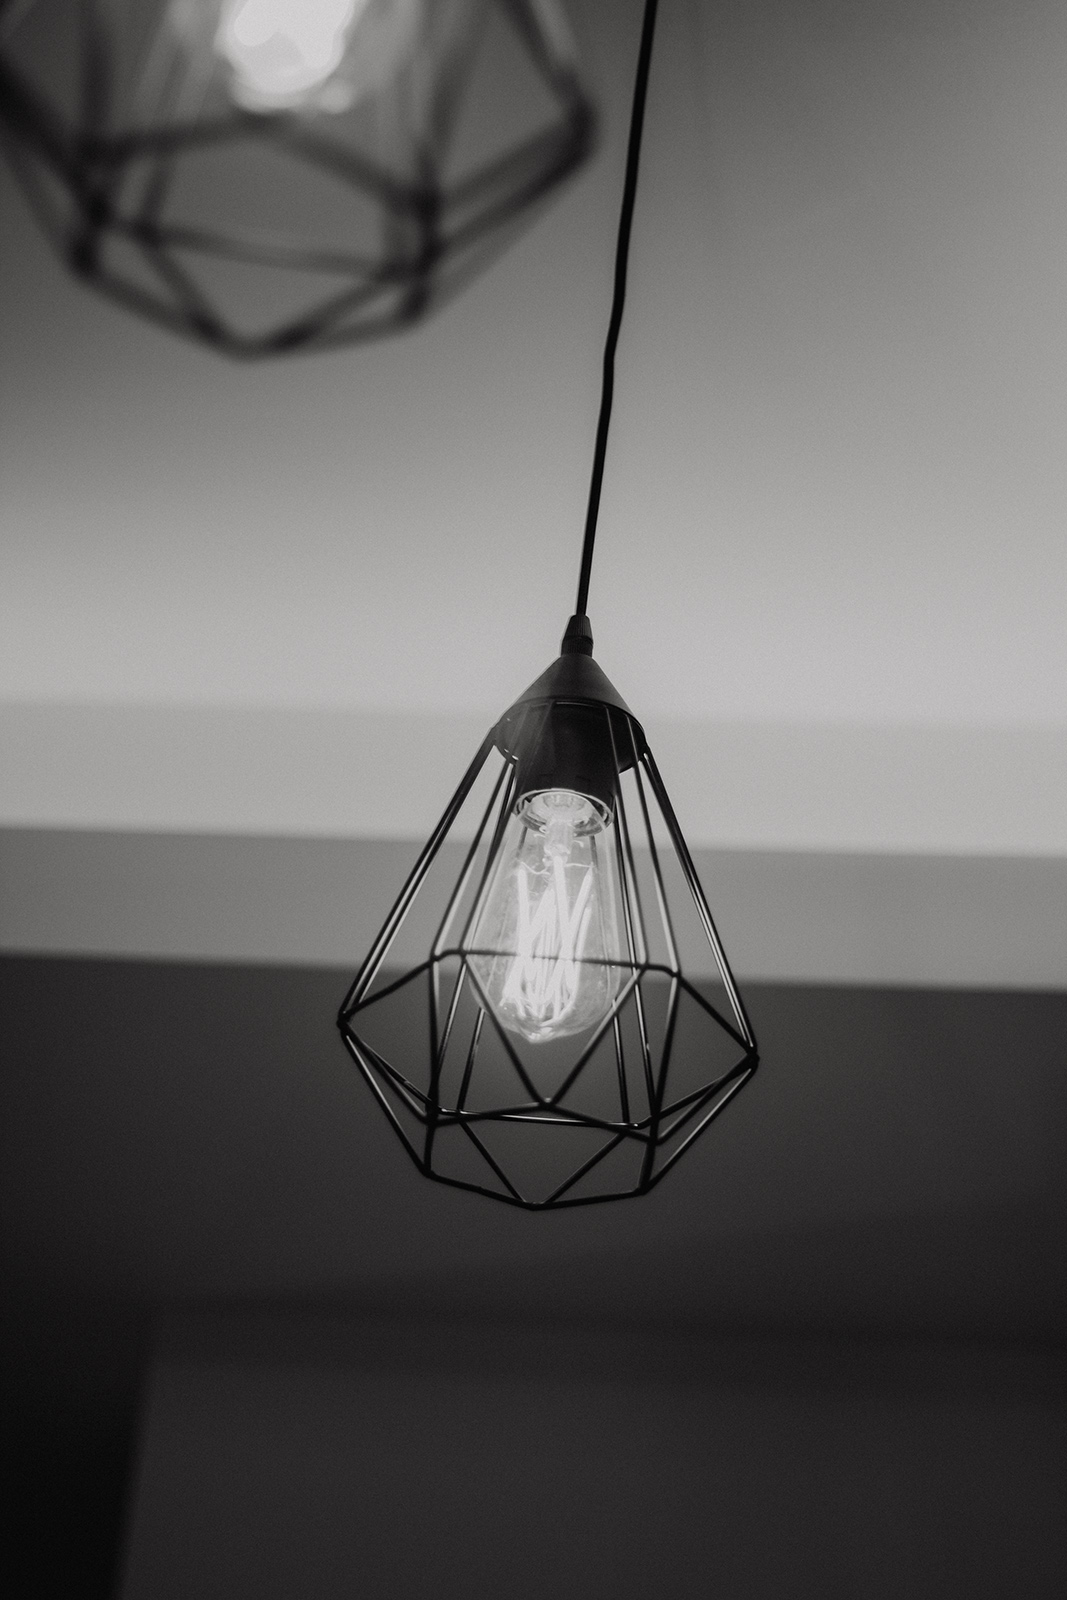 detalle mobiliario, lámpara centro Sabrina navarro